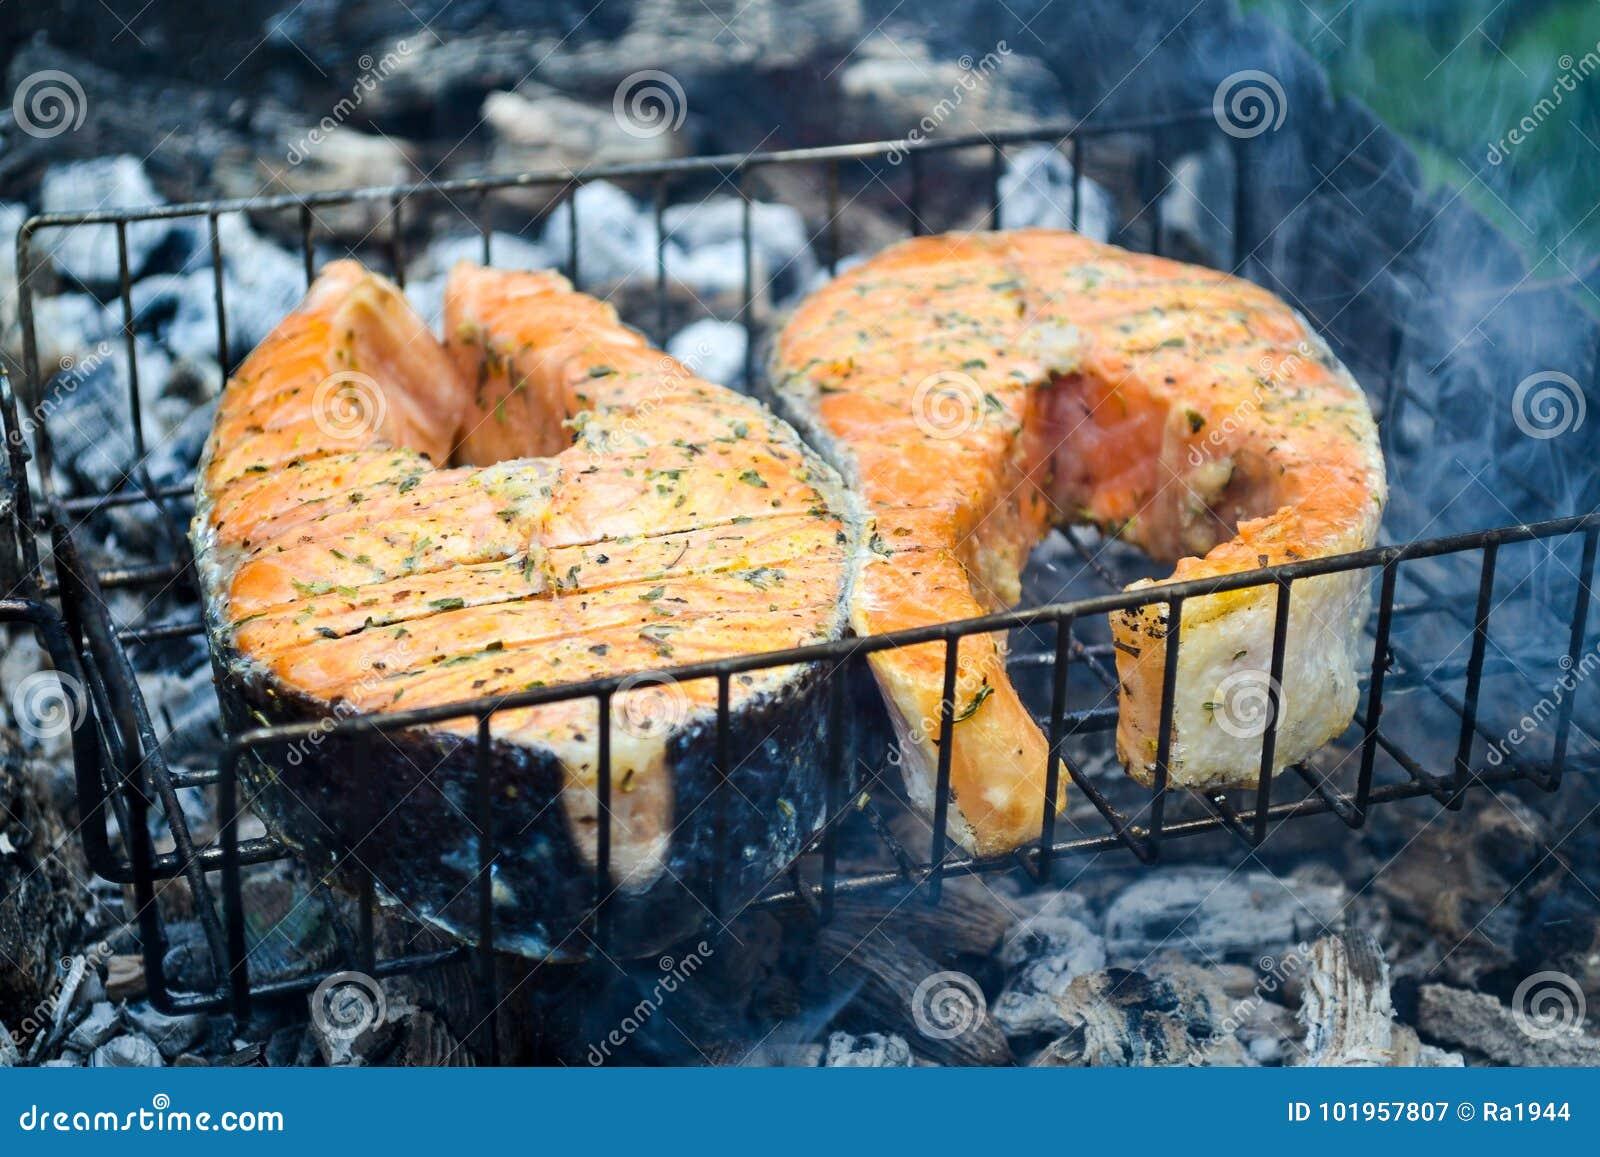 Bife salmon grelhado Grelha, carvões, fumo